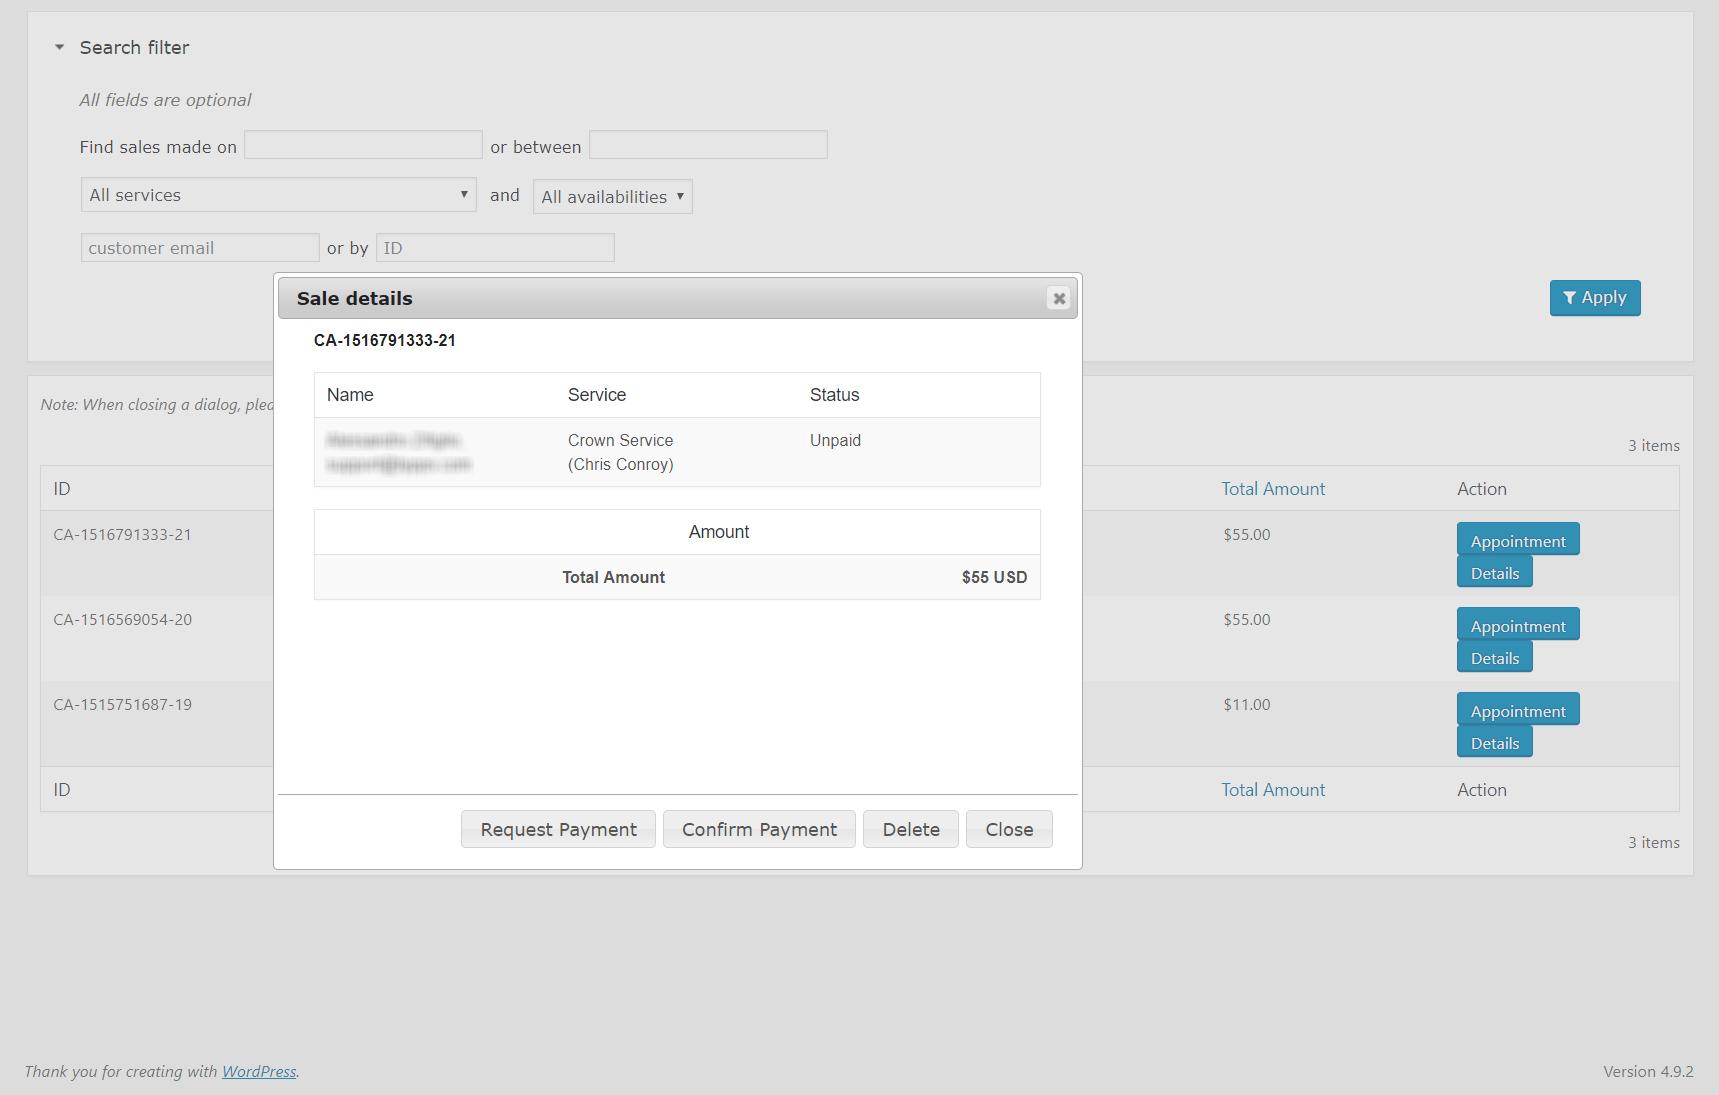 Calendarista Premium - WP Appointment Booking Plugin and Schedule System